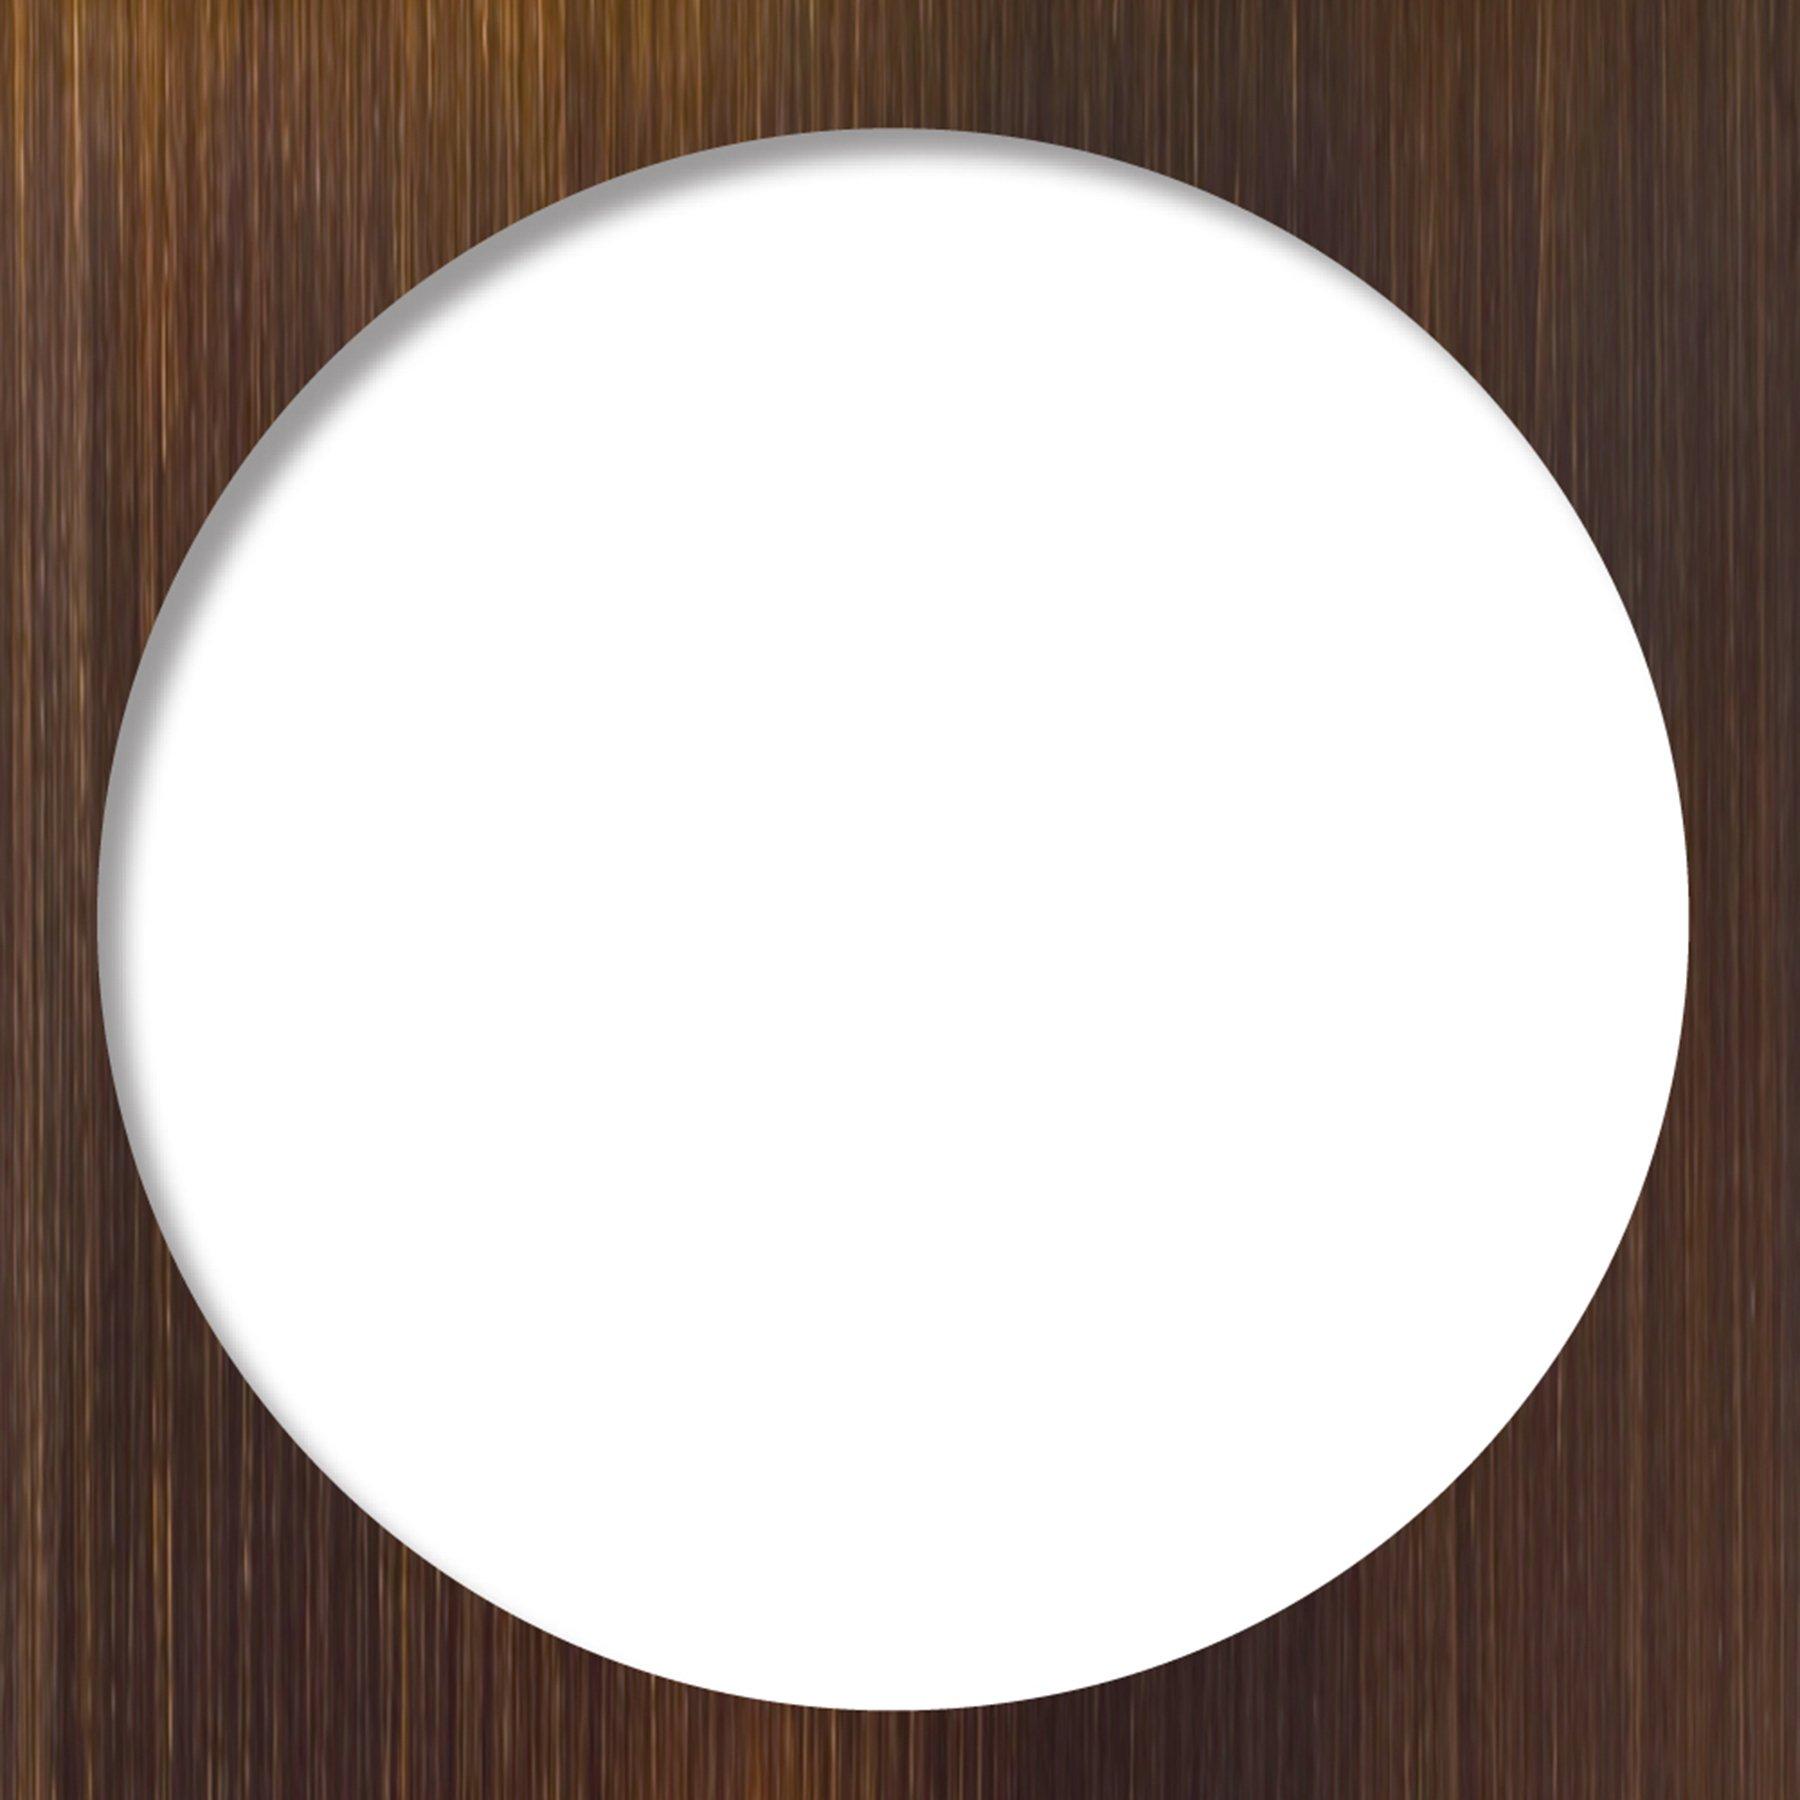 Tile Redi USA DP-SQT-OB Shower Drain, 5.75'' x 5.75'', Oil Rubbed Bronze